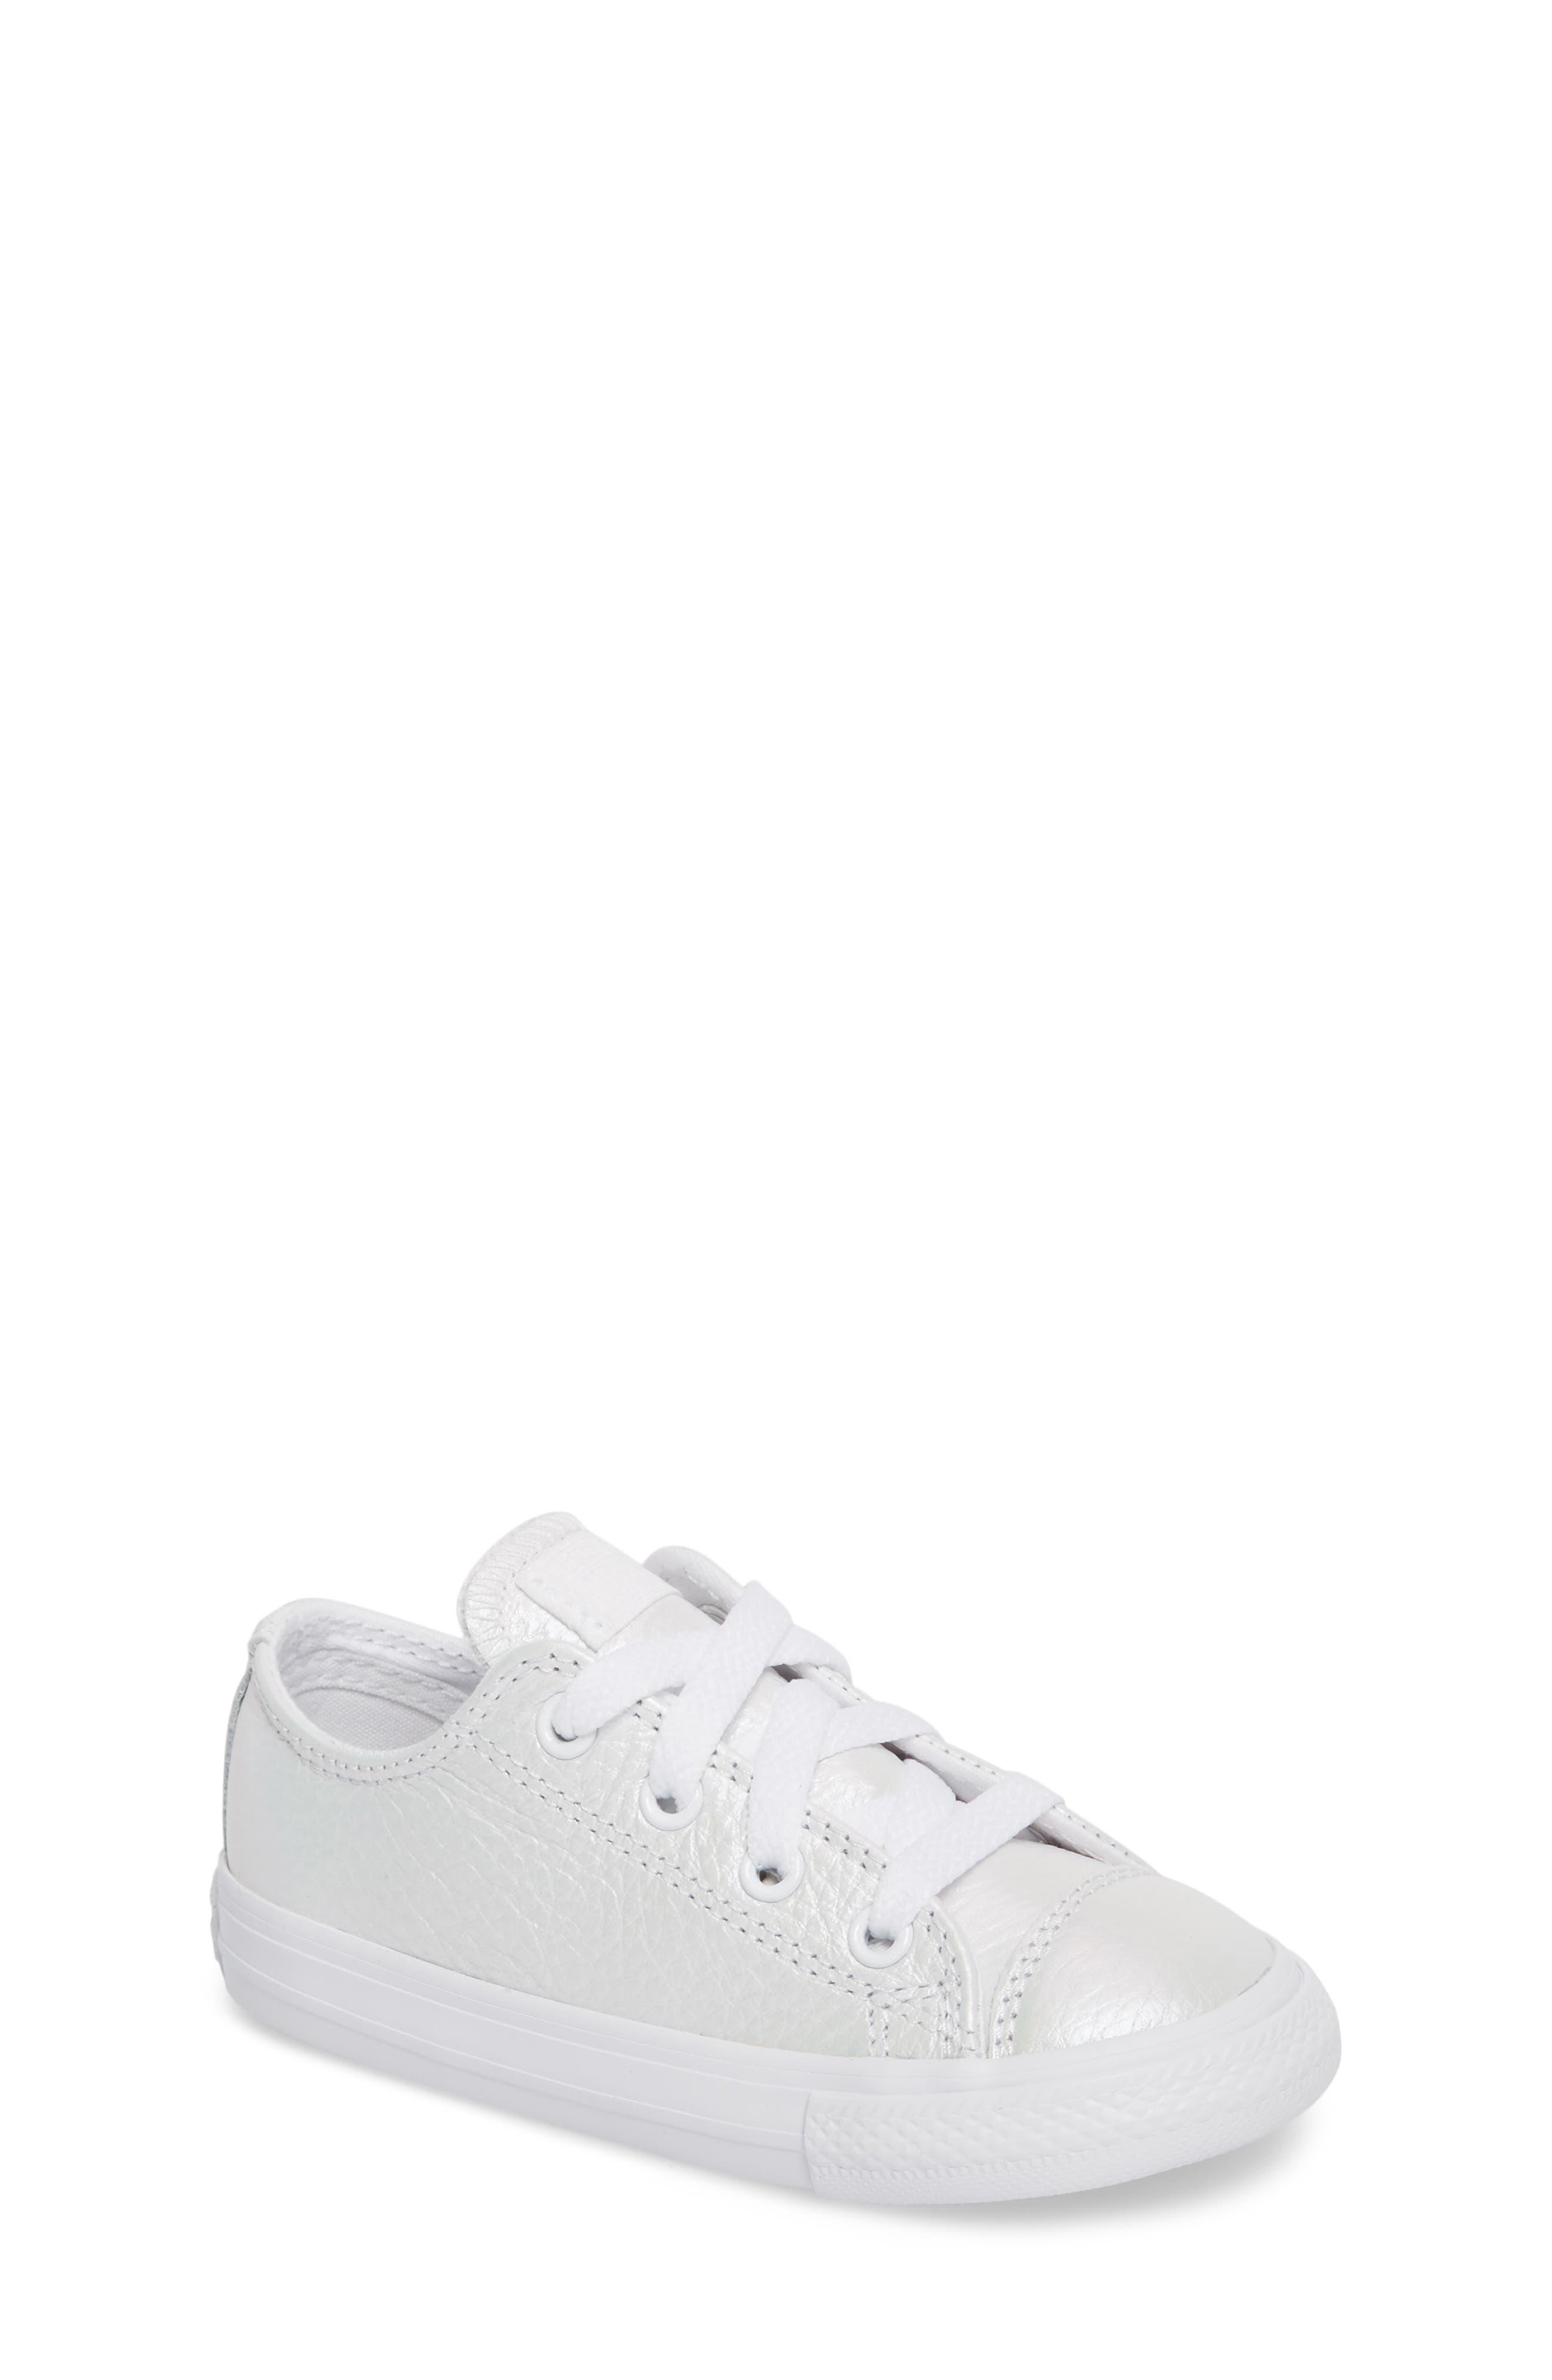 Chuck Taylor<sup>®</sup> All Star<sup>®</sup> Iridescent Sneaker,                             Main thumbnail 1, color,                             100